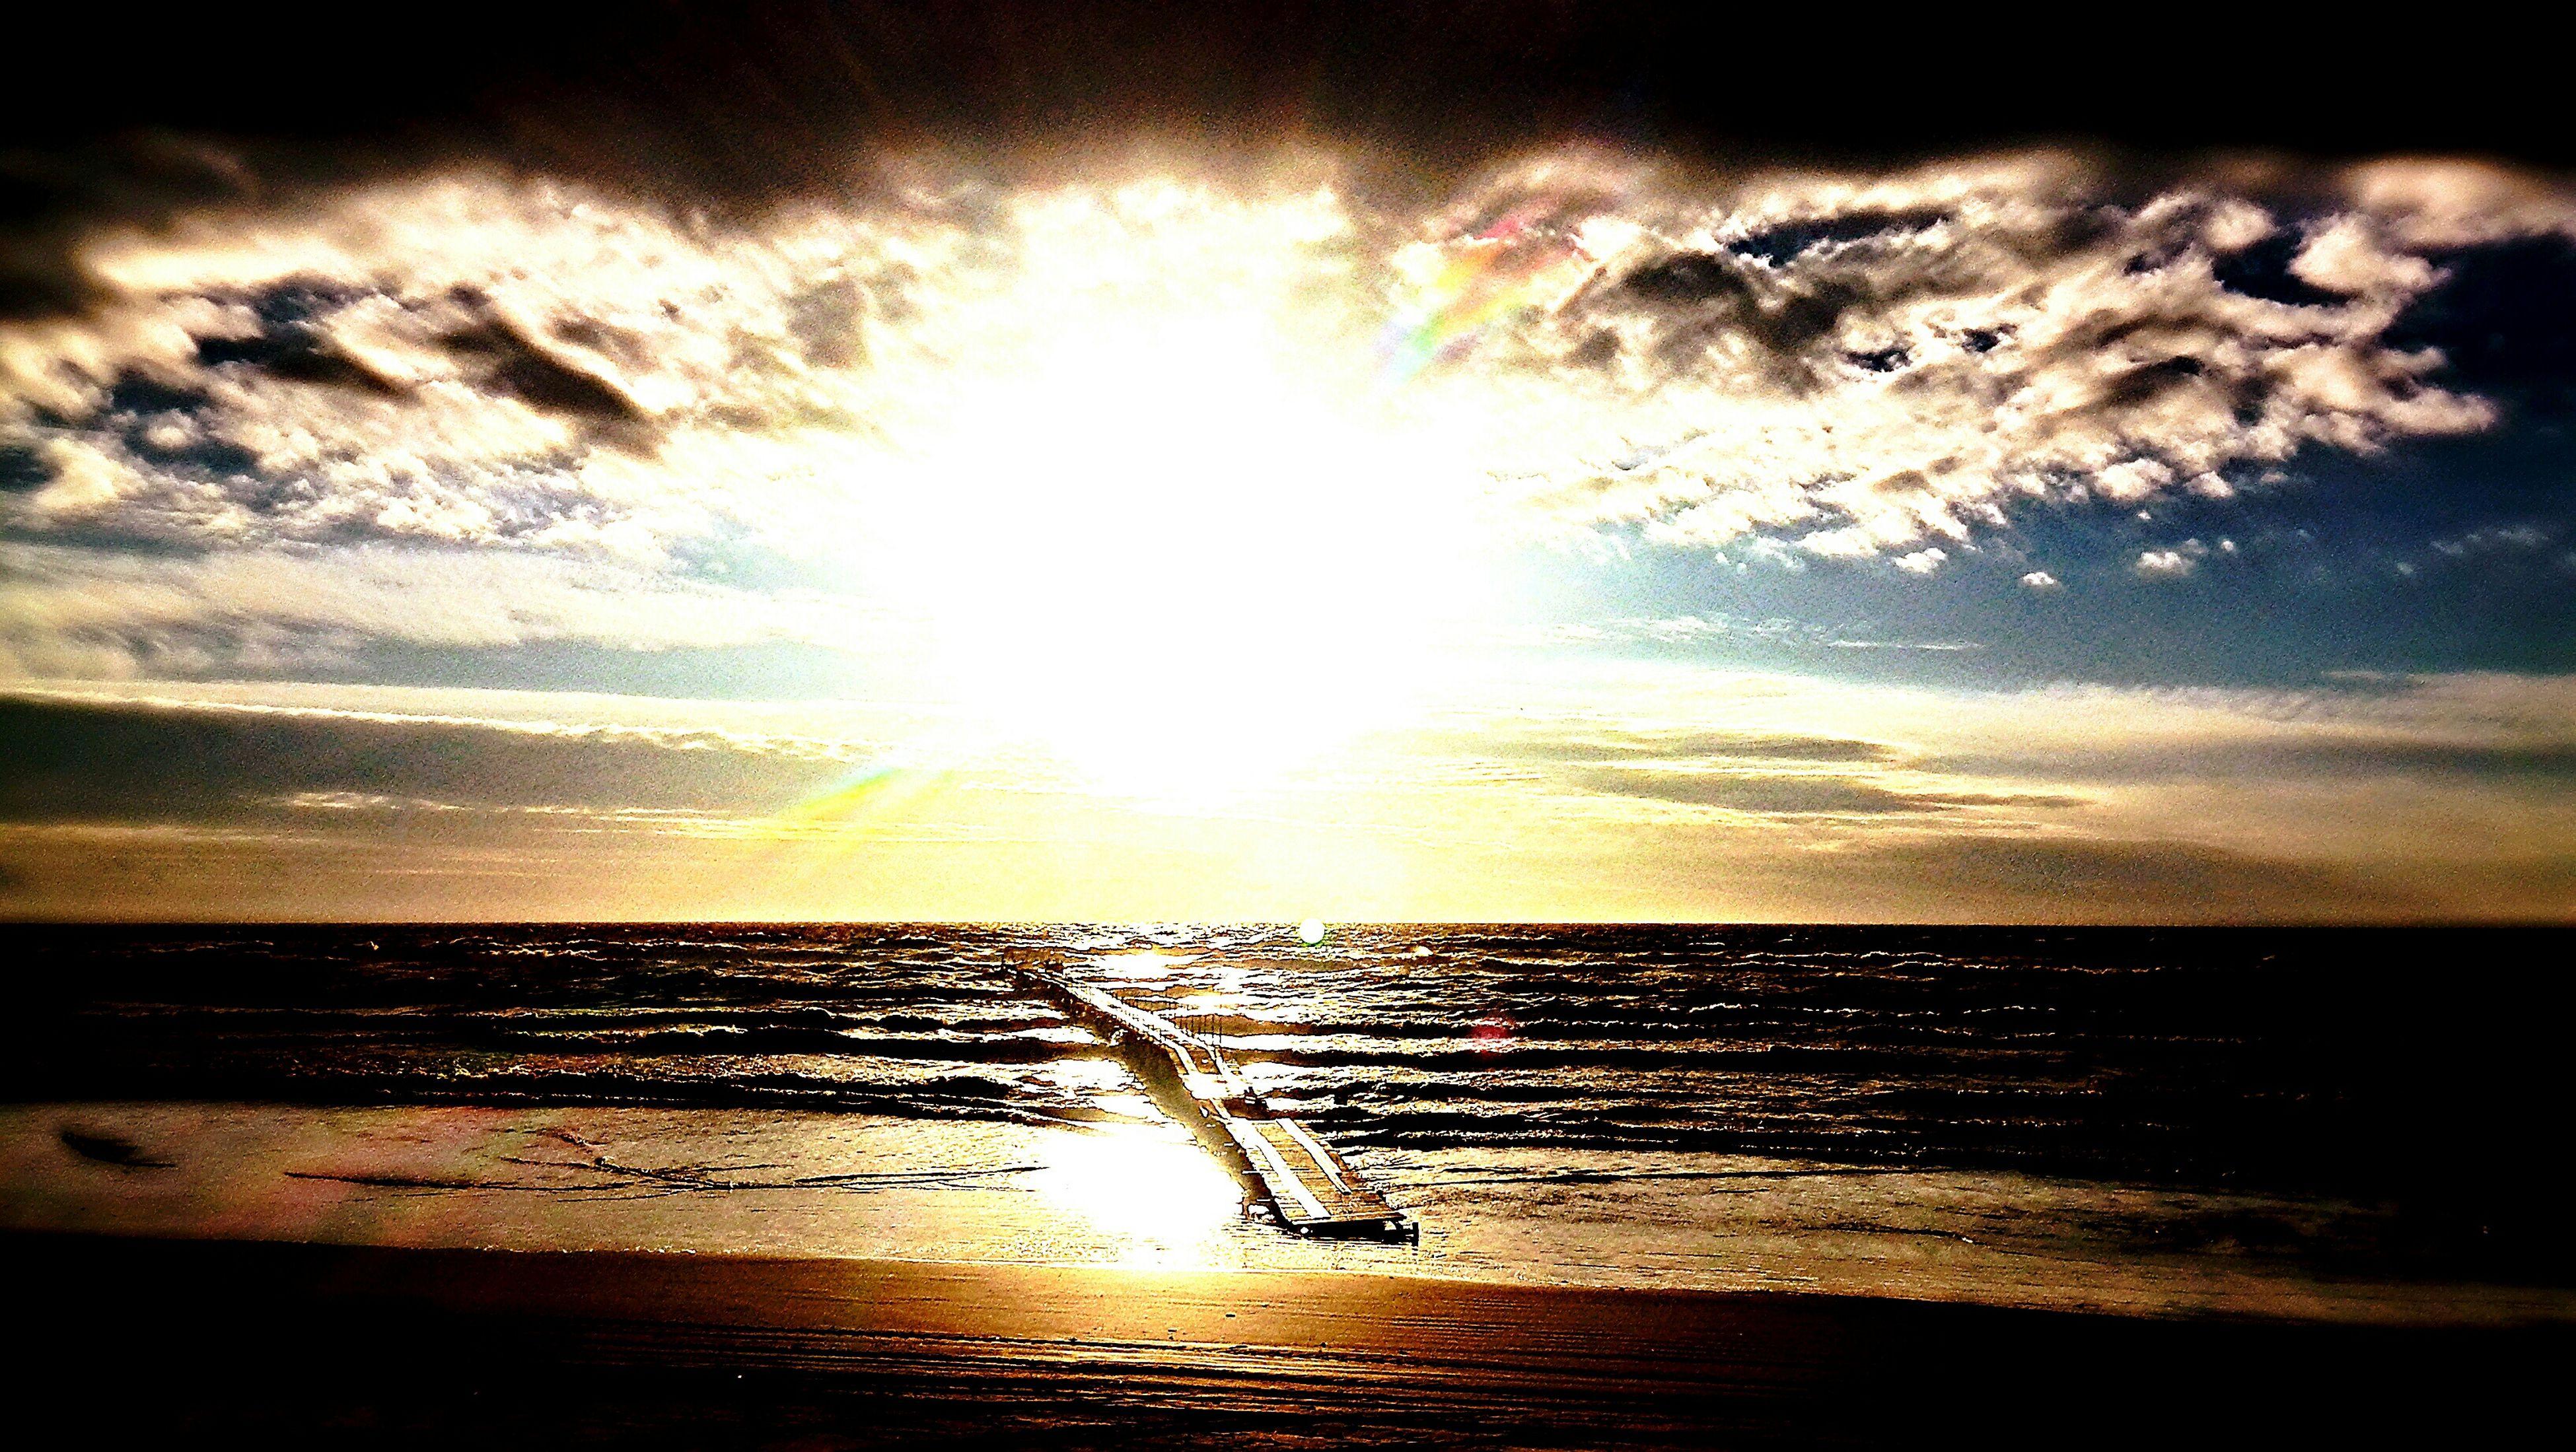 sea, water, horizon over water, sun, beach, sky, sunset, scenics, shore, tranquil scene, beauty in nature, sunbeam, tranquility, reflection, cloud - sky, sunlight, idyllic, nature, wave, lens flare